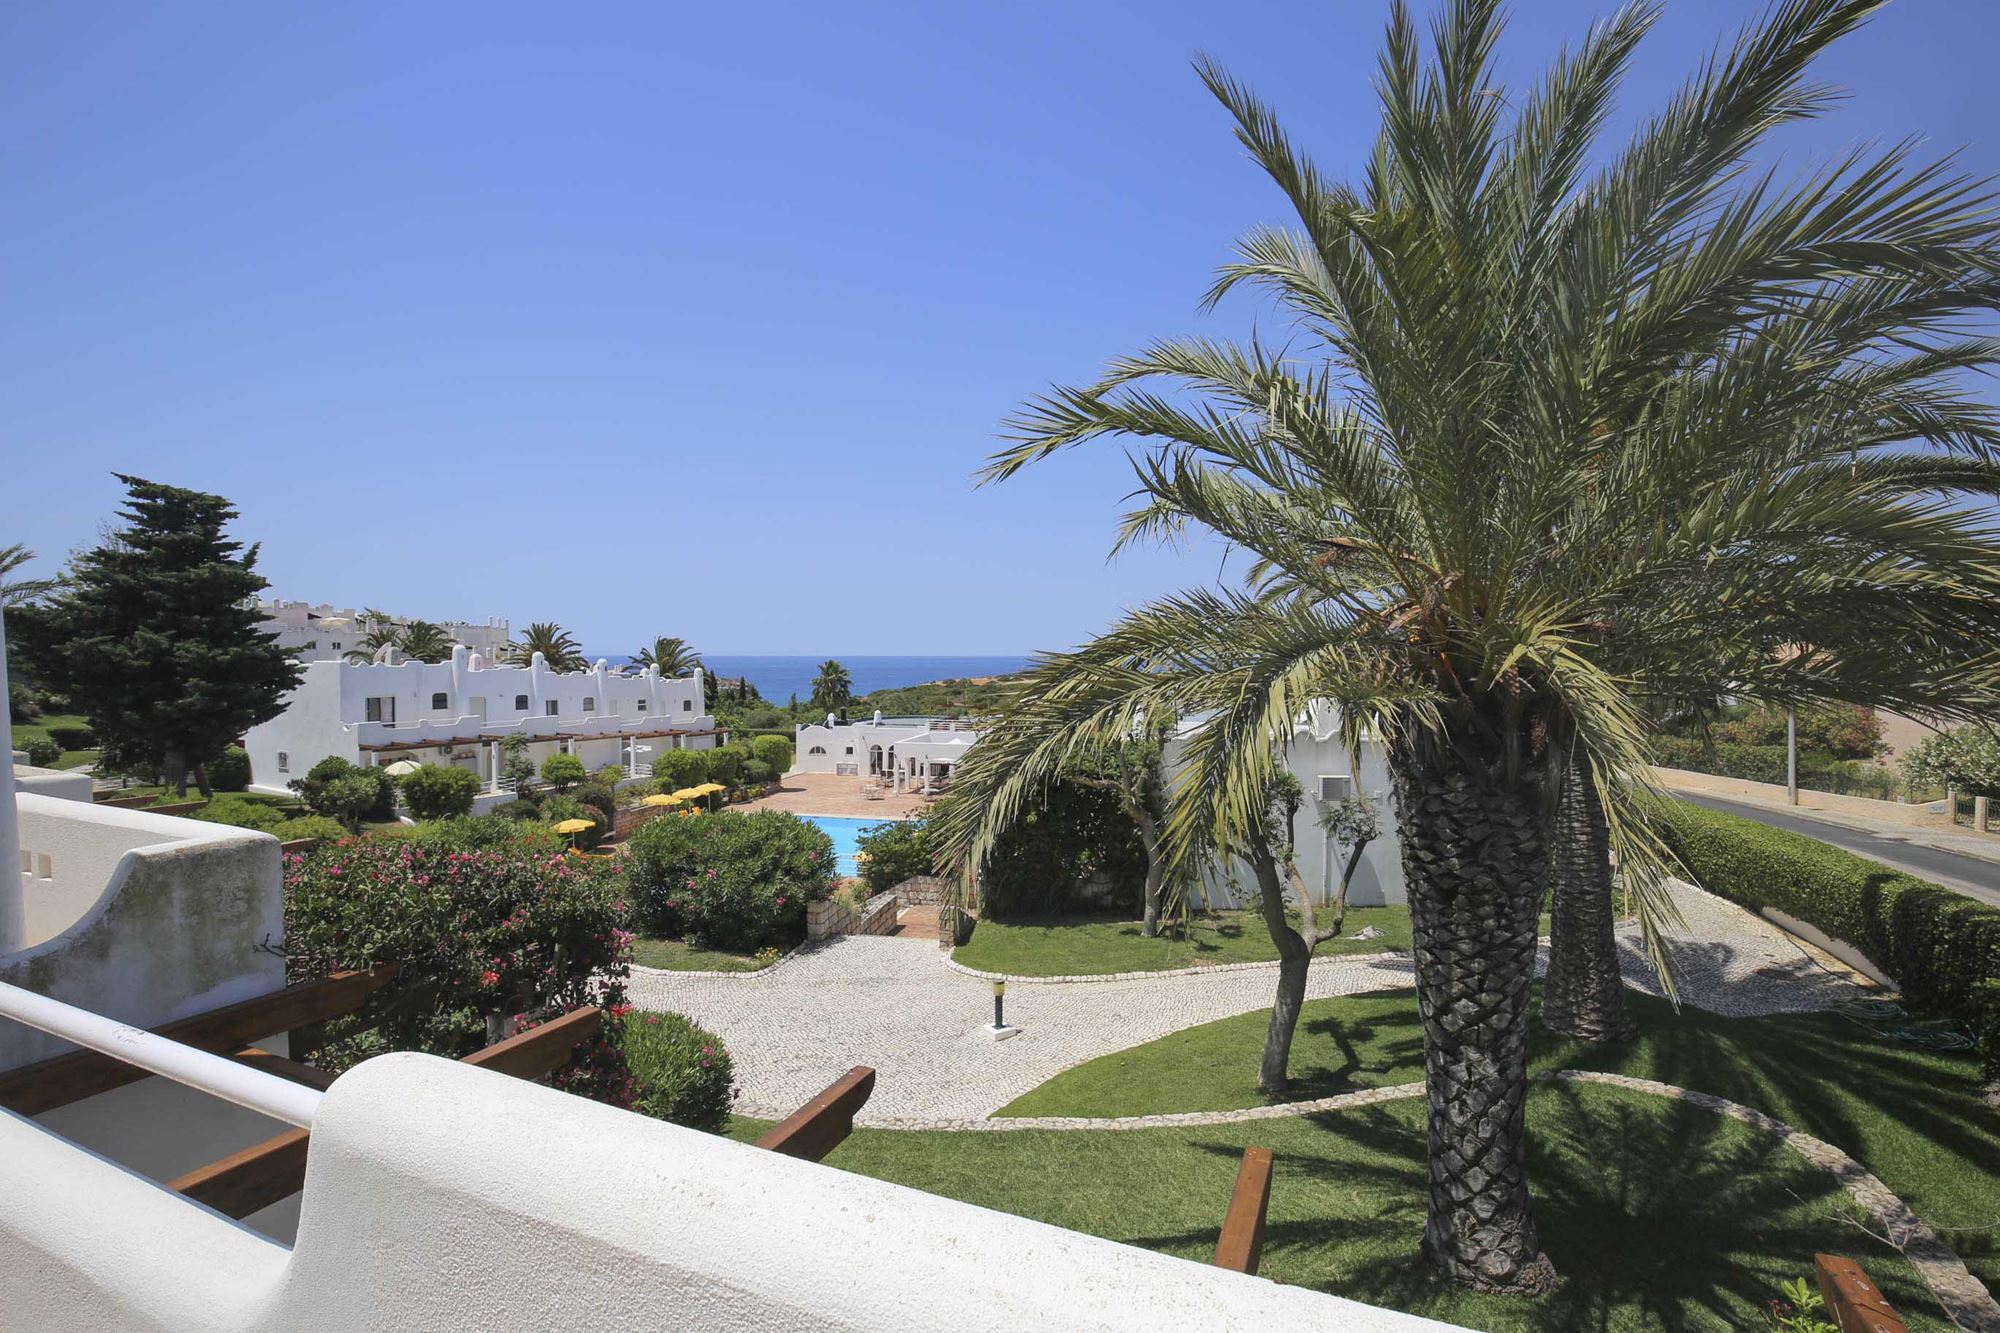 Villa Gaivotta T2 Sea view Algarve-balcony- enneking premium rentals